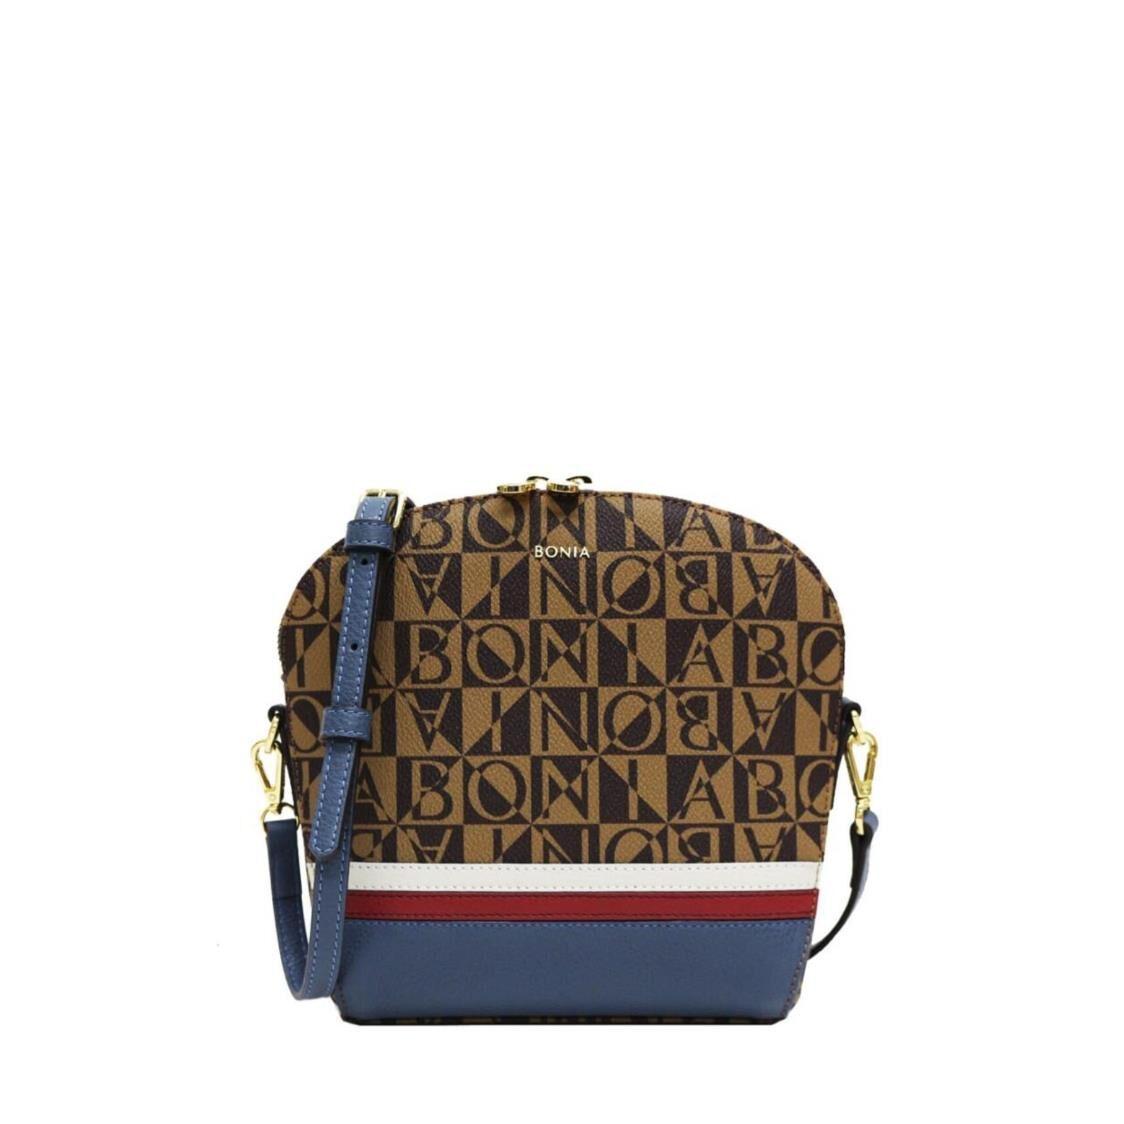 Bonia Monogram Crossbody Bag 801405-008-78